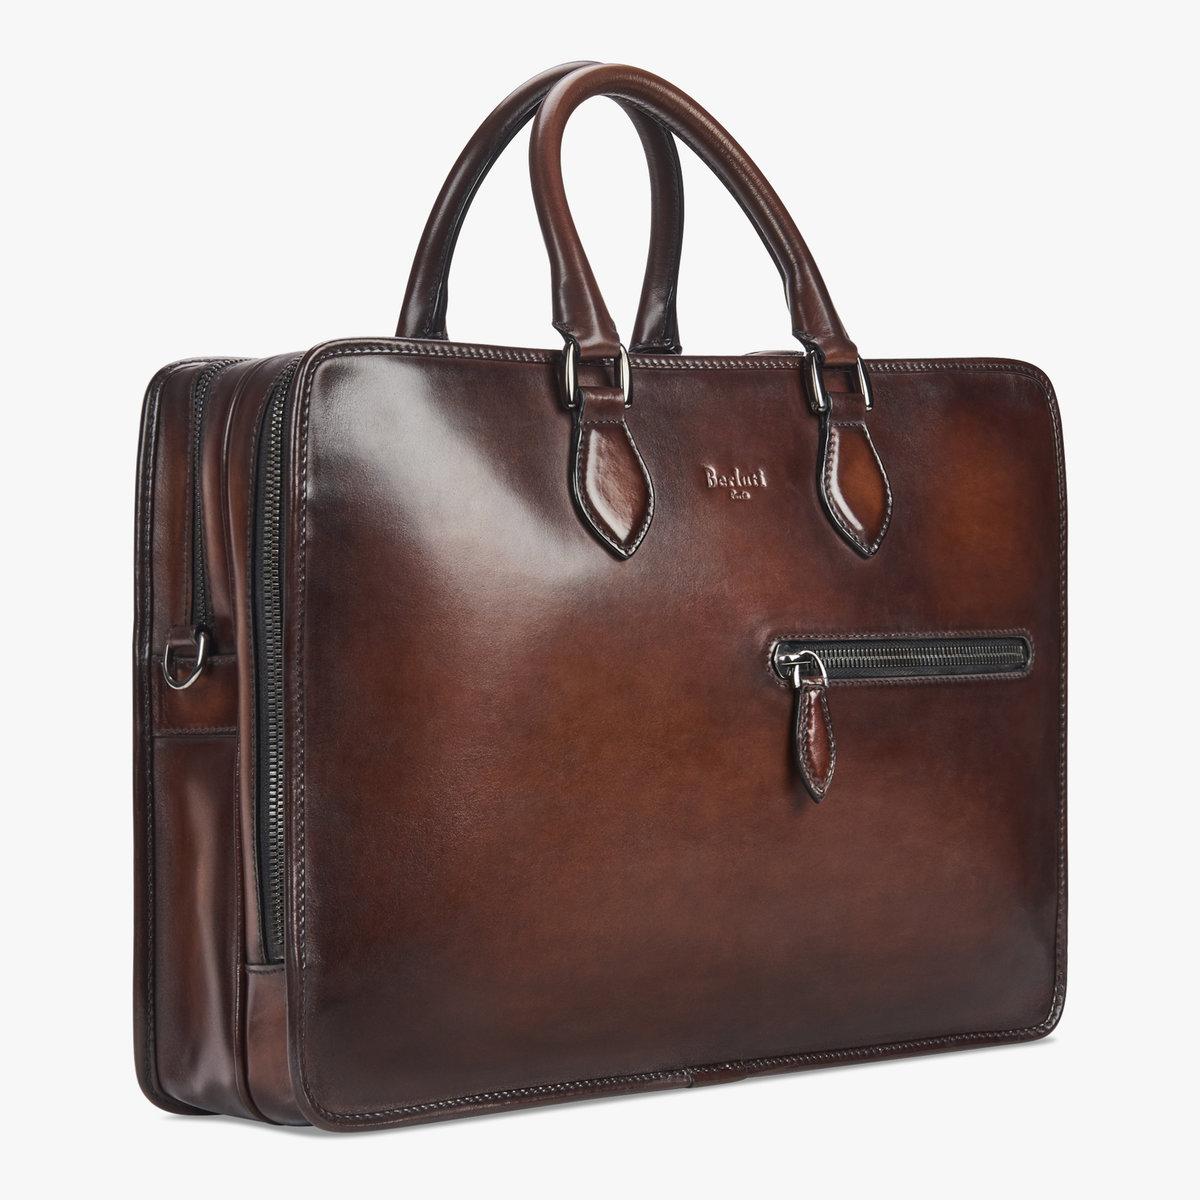 deux-jours-leather-briefcase-brown-berluti_3.jpeg